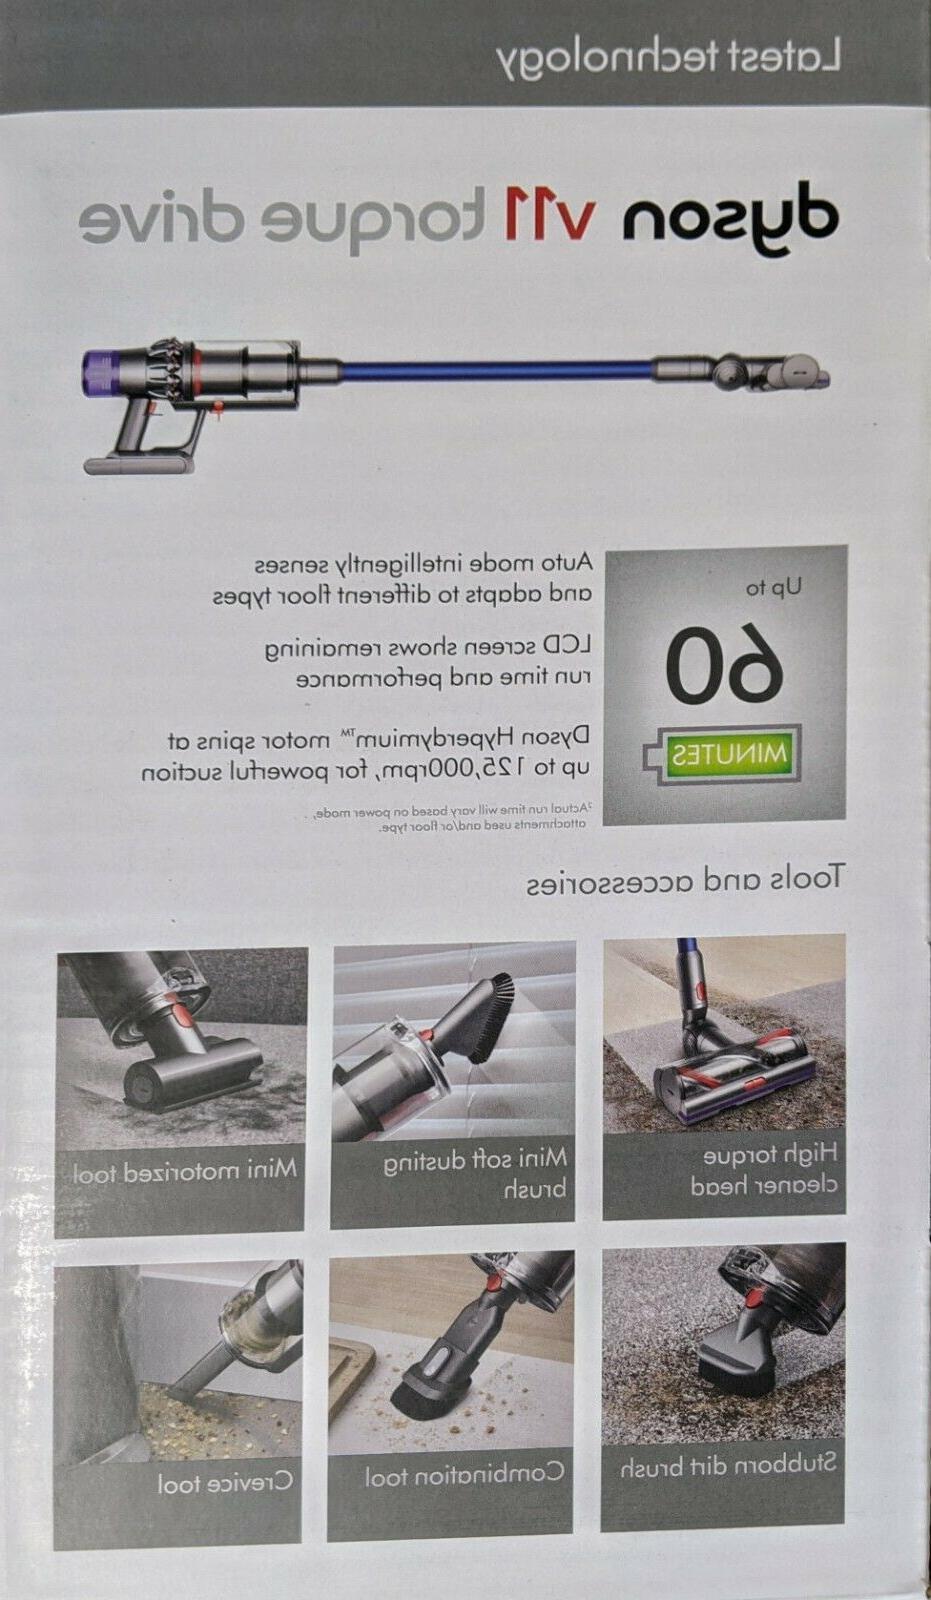 Dyson V11 Torque Cordless Vacuum | New Click-in